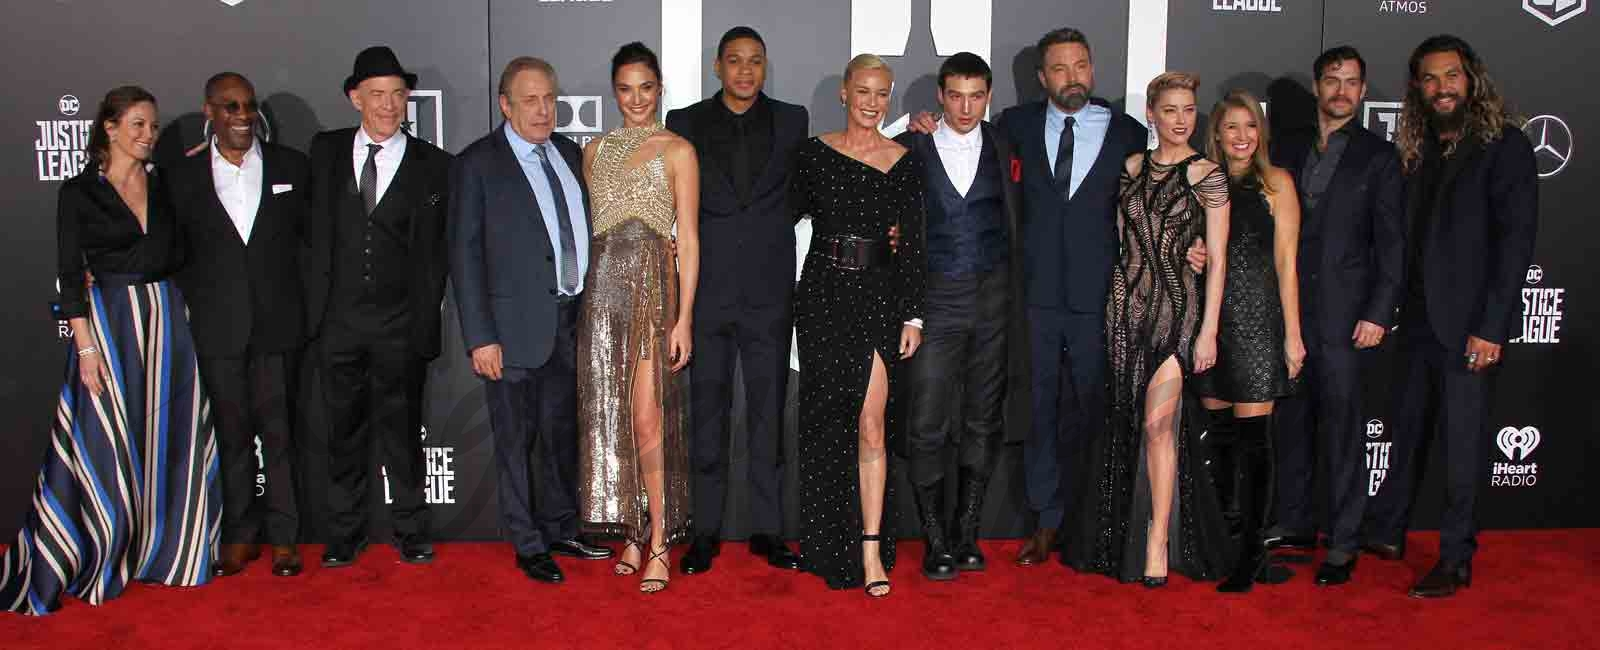 "La alfombra roja del estreno mundial de ""Liga de la justicia"""